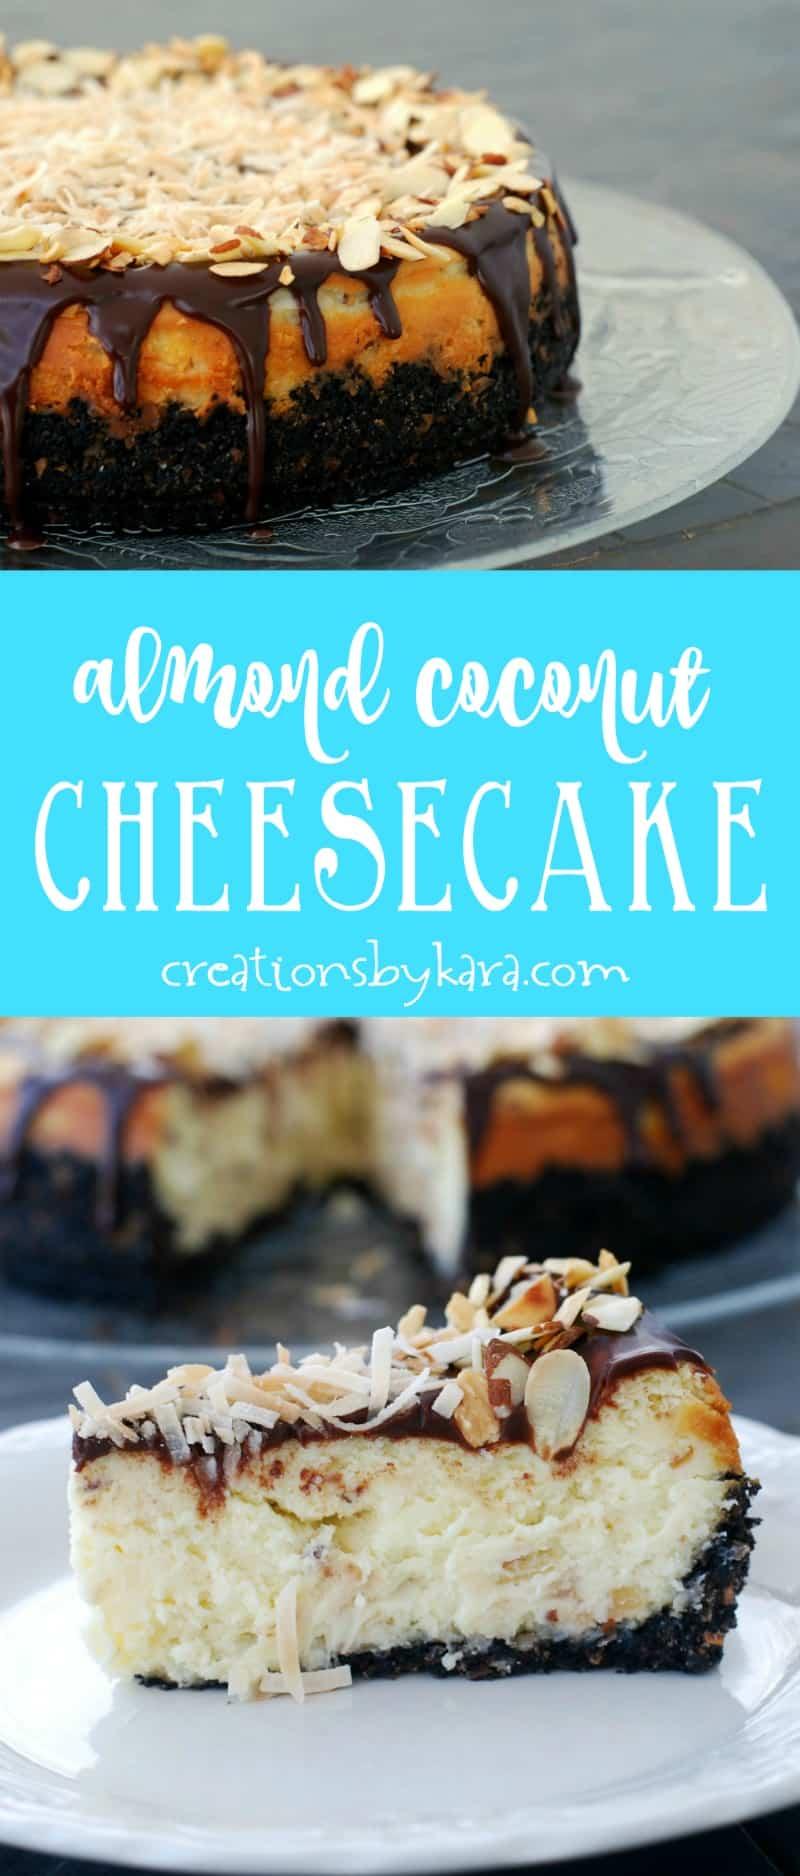 Cheesecake Recipe Made With Yellow Cake Mix